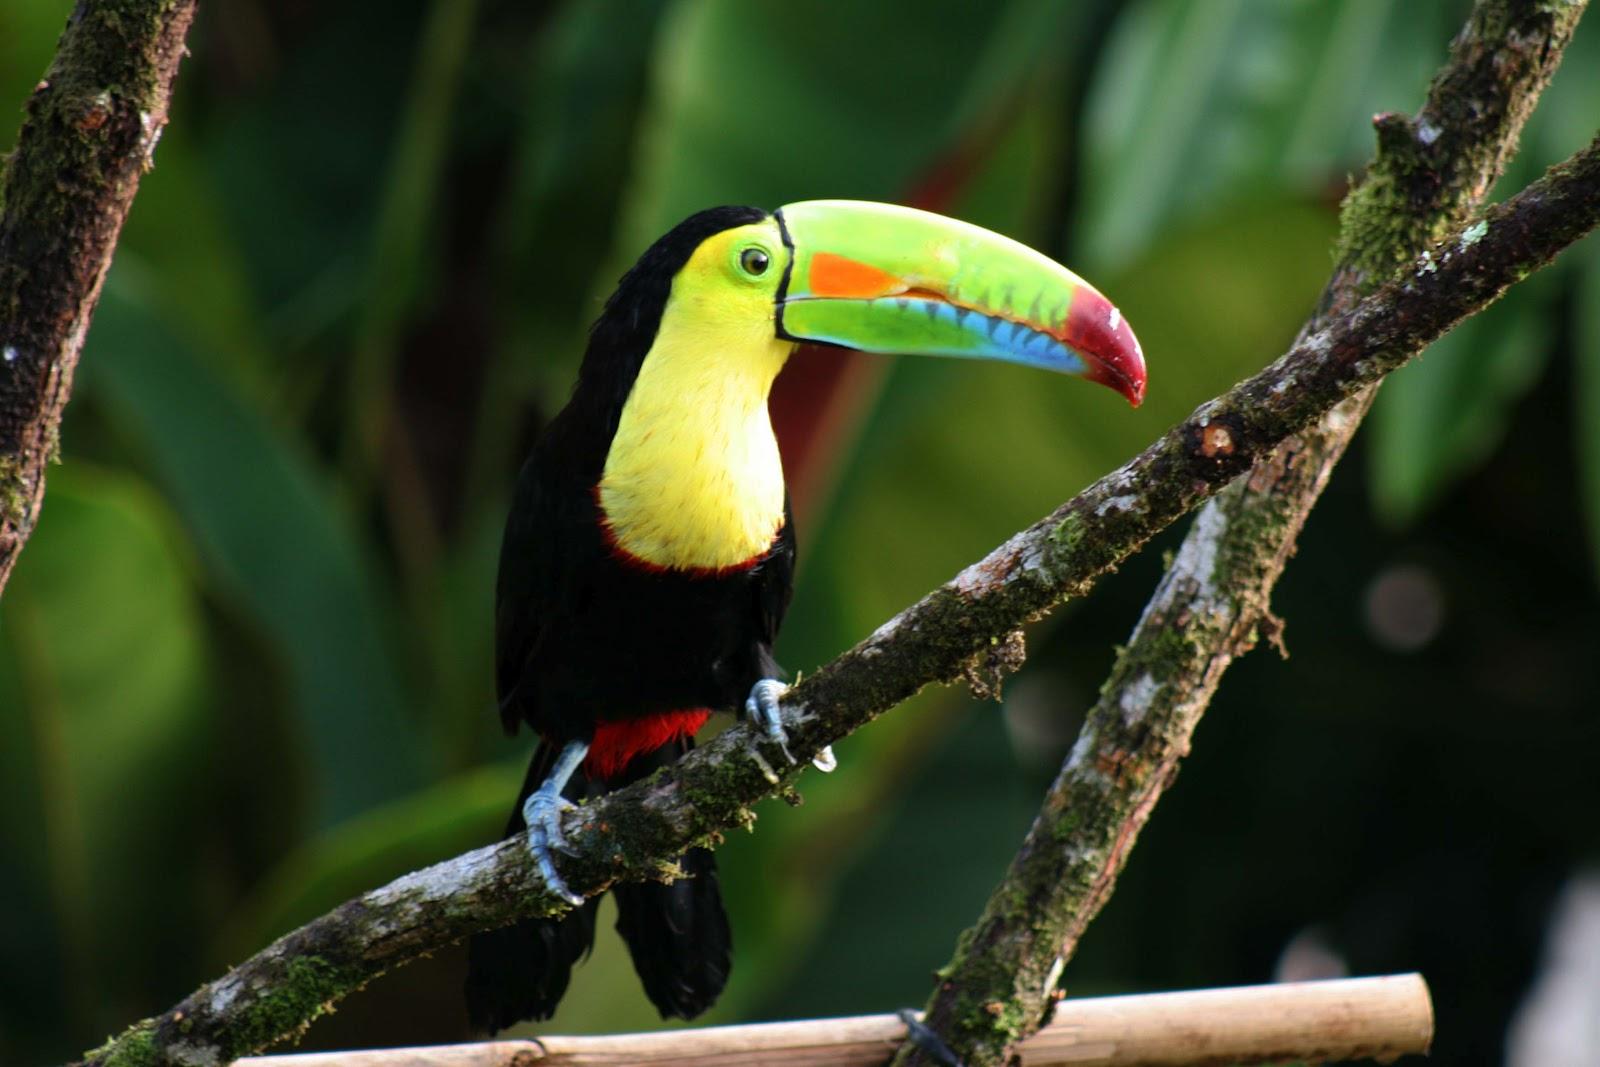 red-junglefowl Common Birds Of Bali